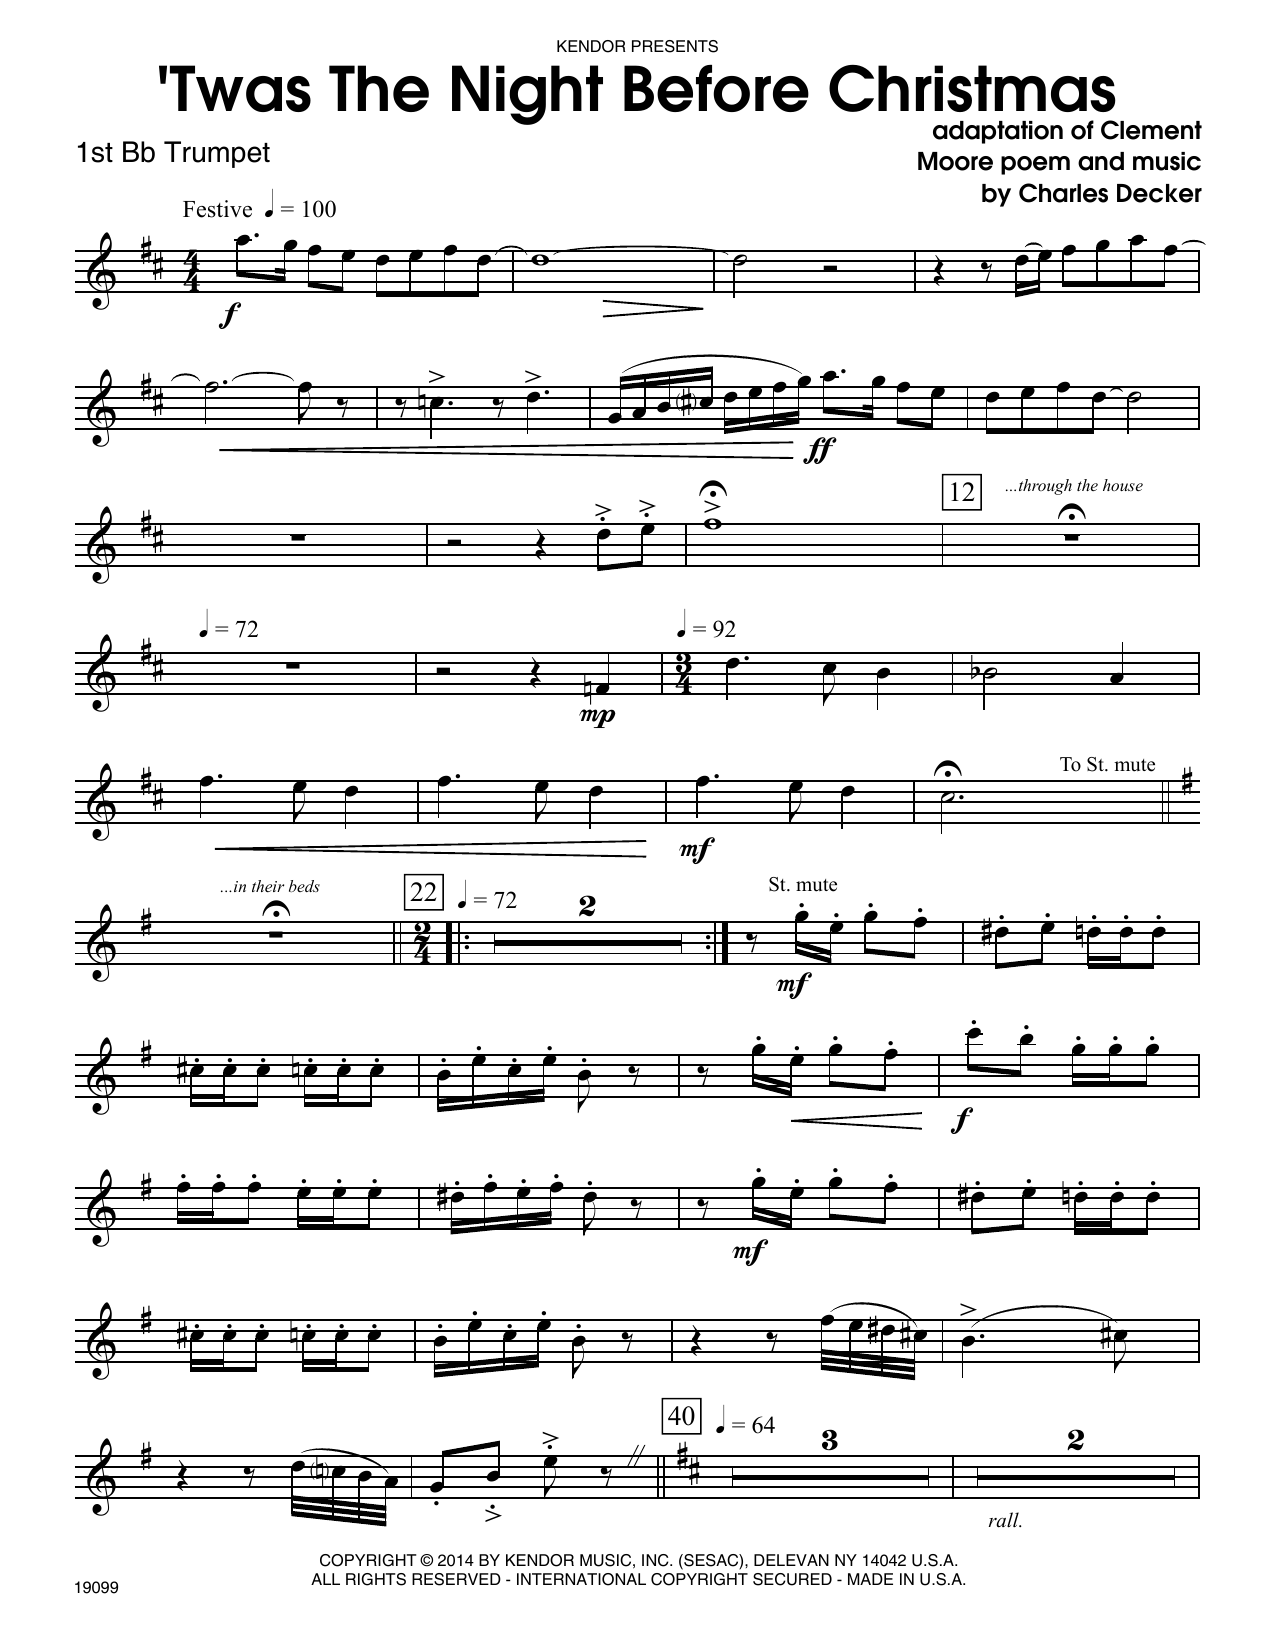 Twas The Night Before Christmas - 1st Bb Trumpet Sheet Music